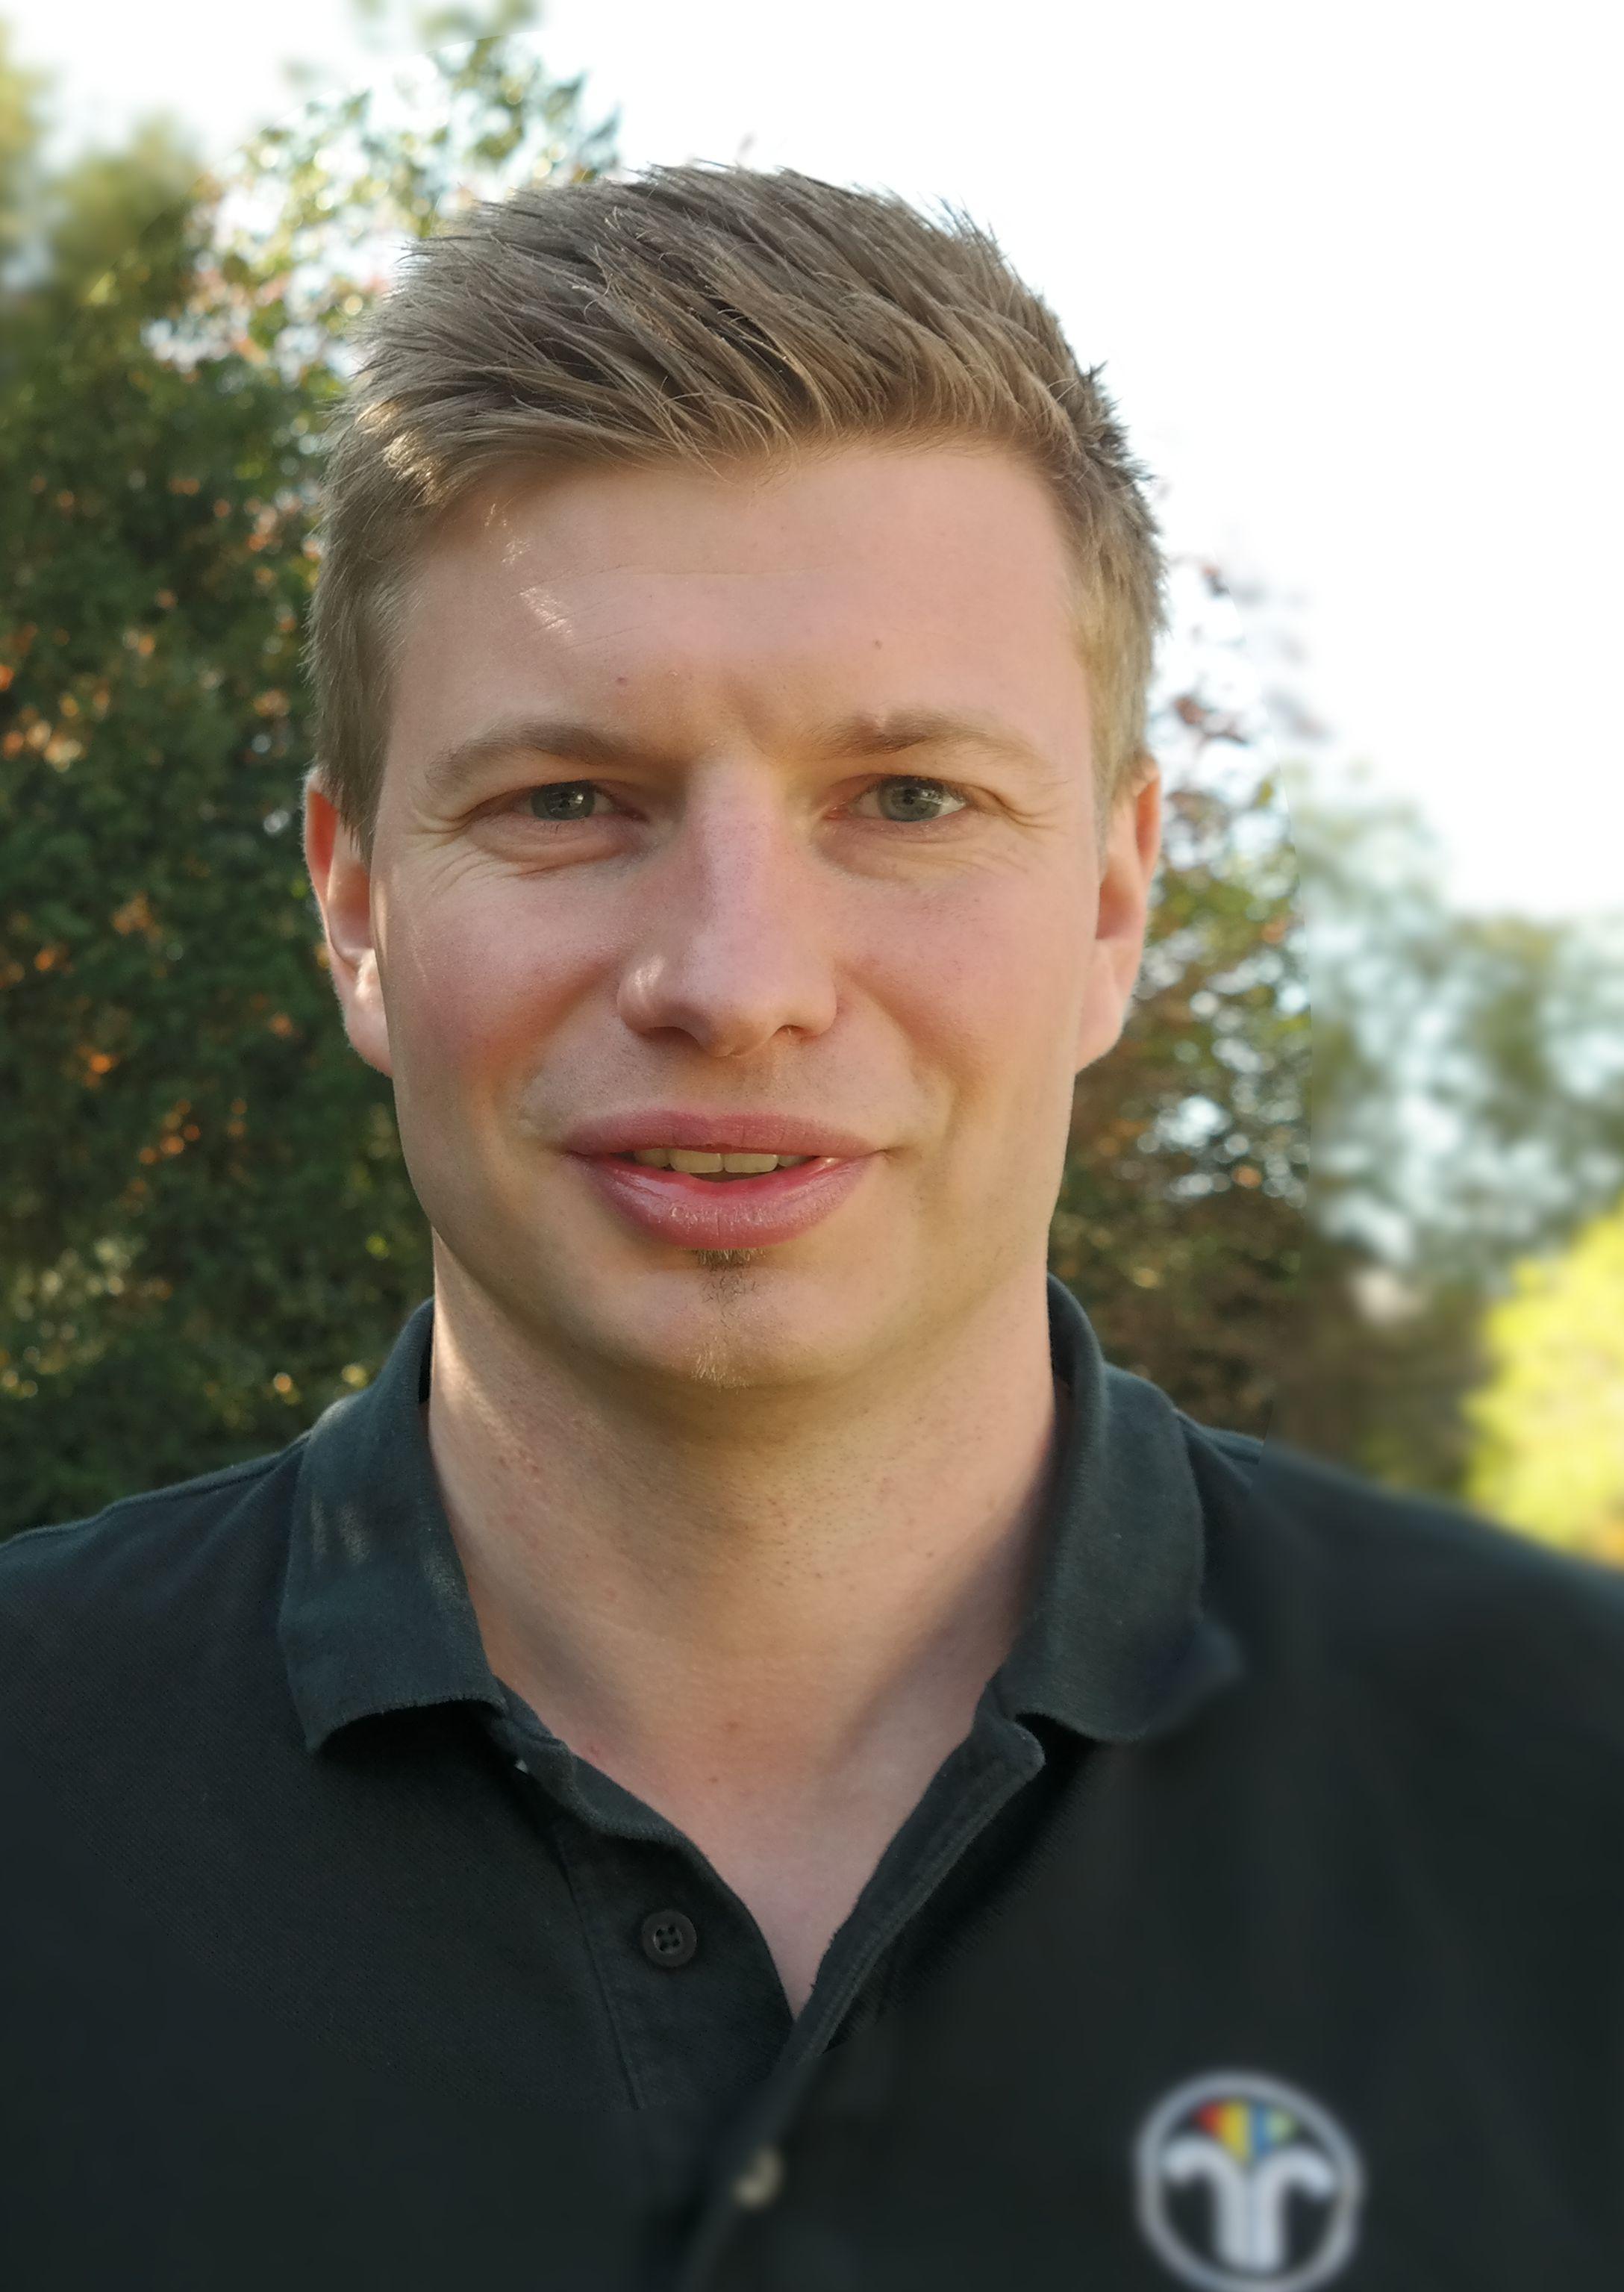 Alfred Versick